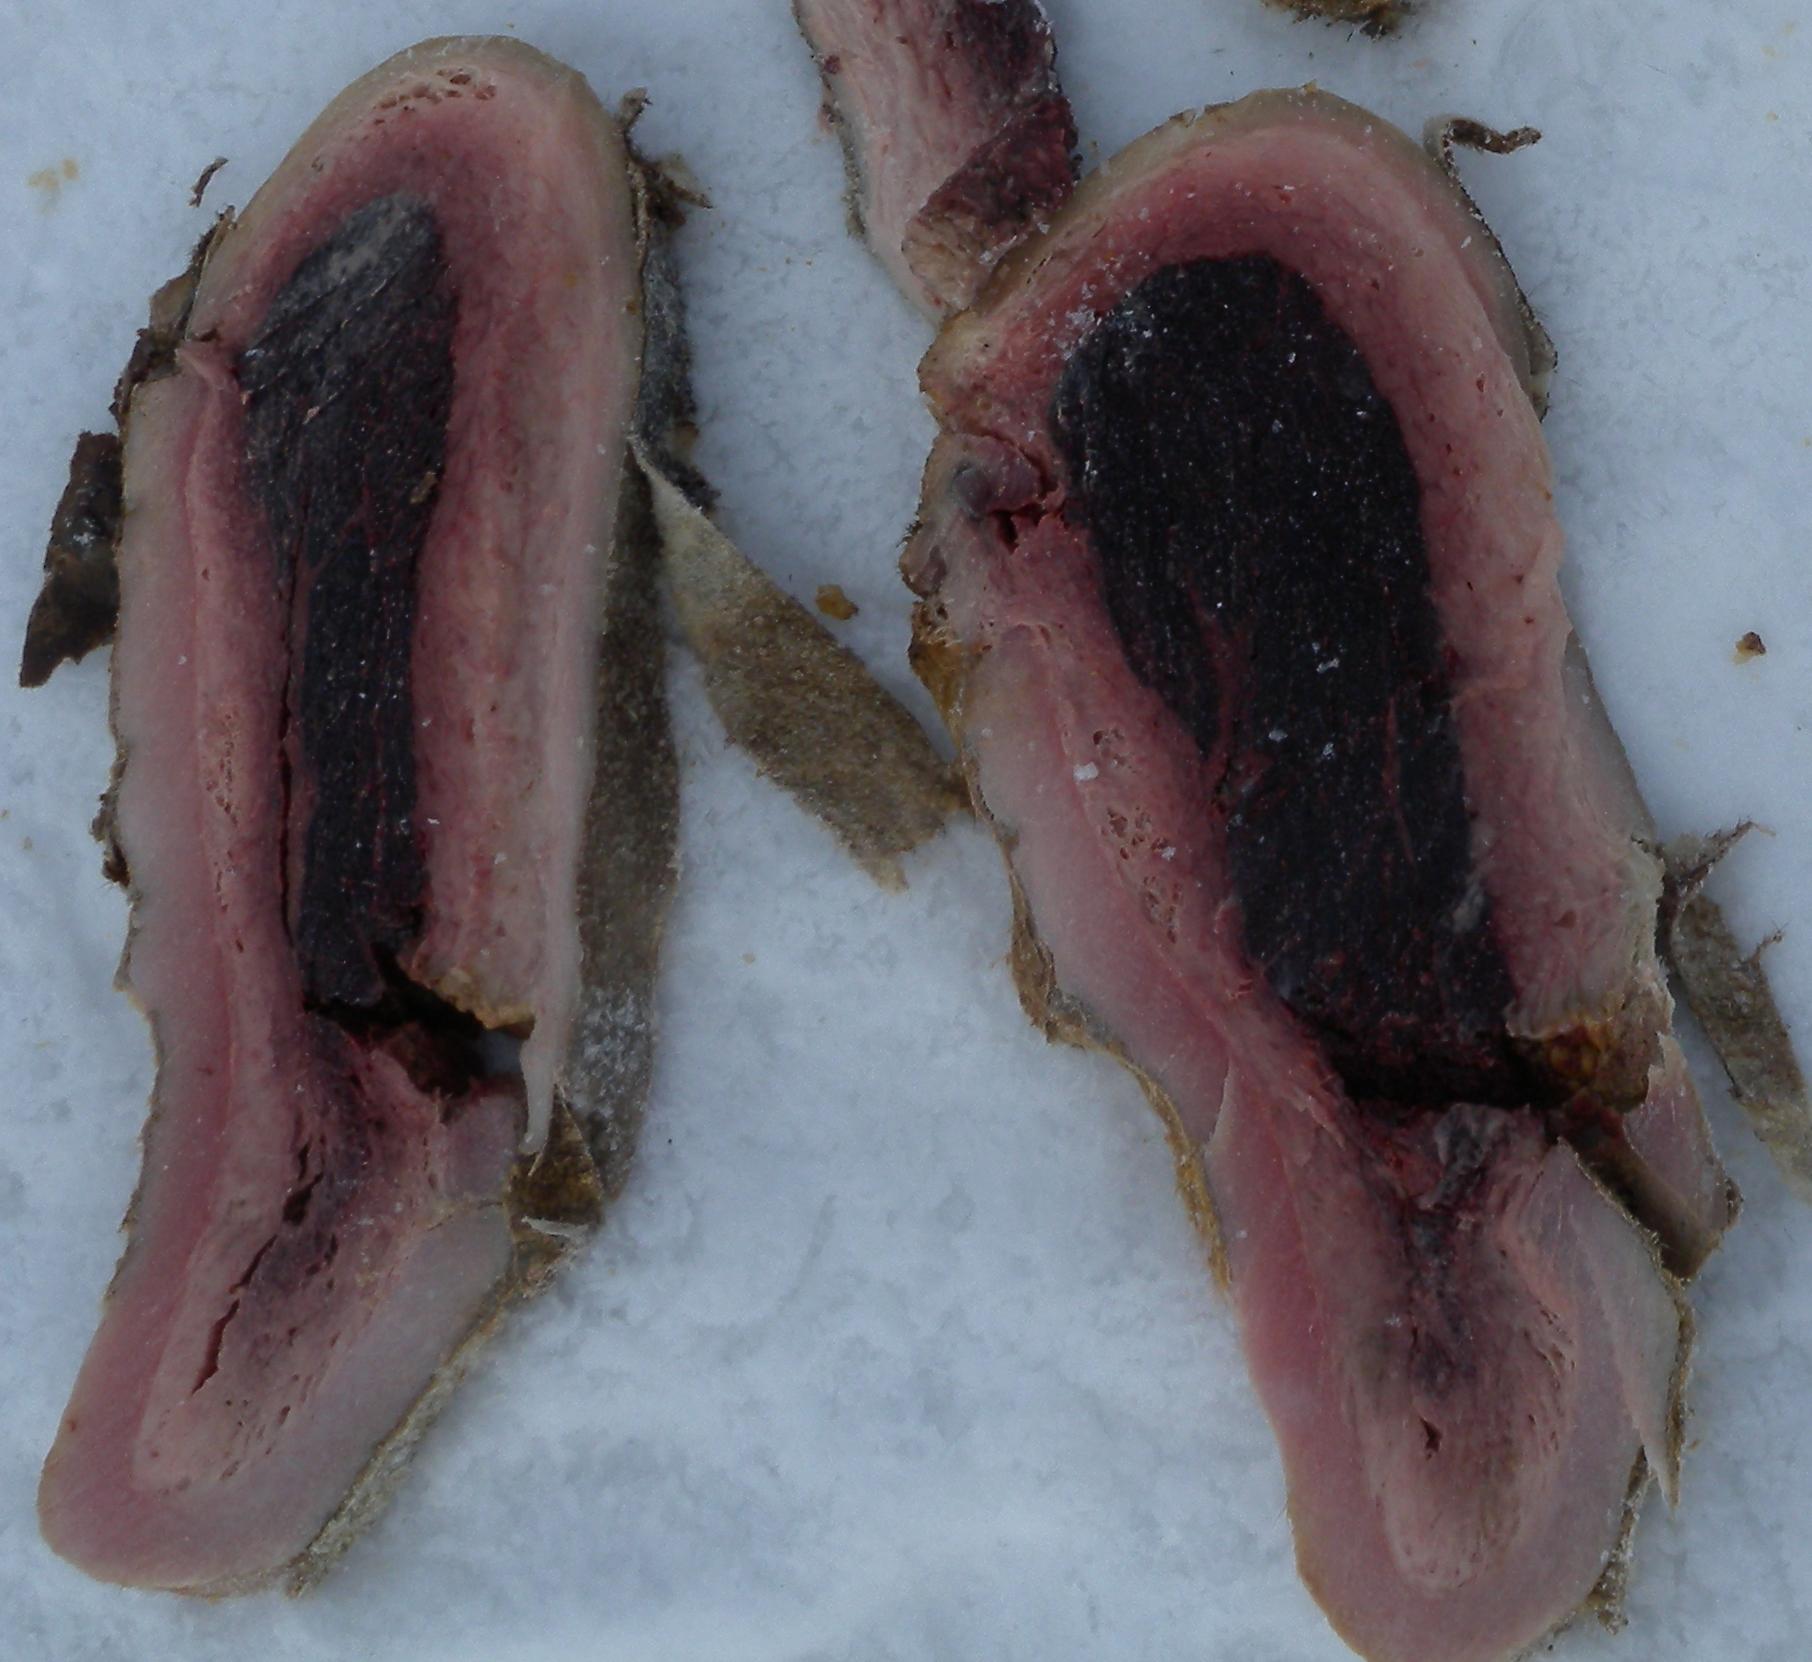 A walrus roulade is shown up close. All photos courtesy Sveta